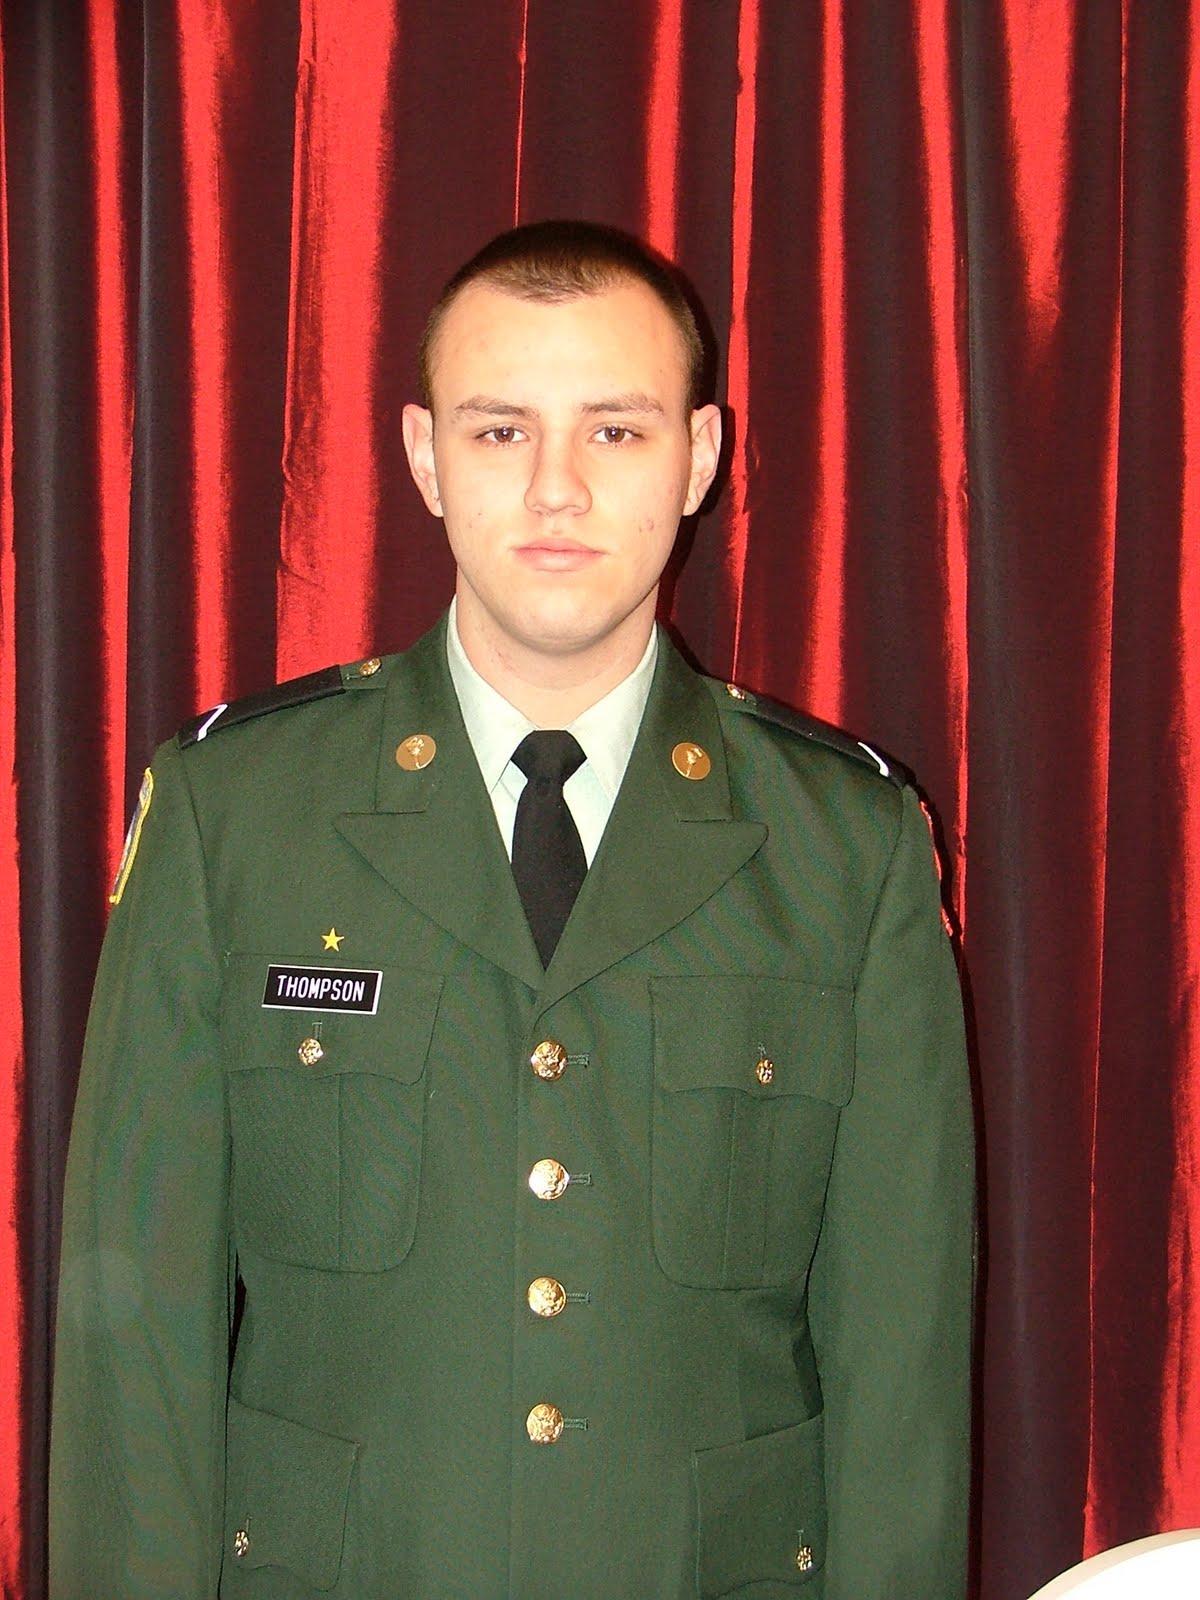 Army Class A Uniform Insignia - Teen Free Vids